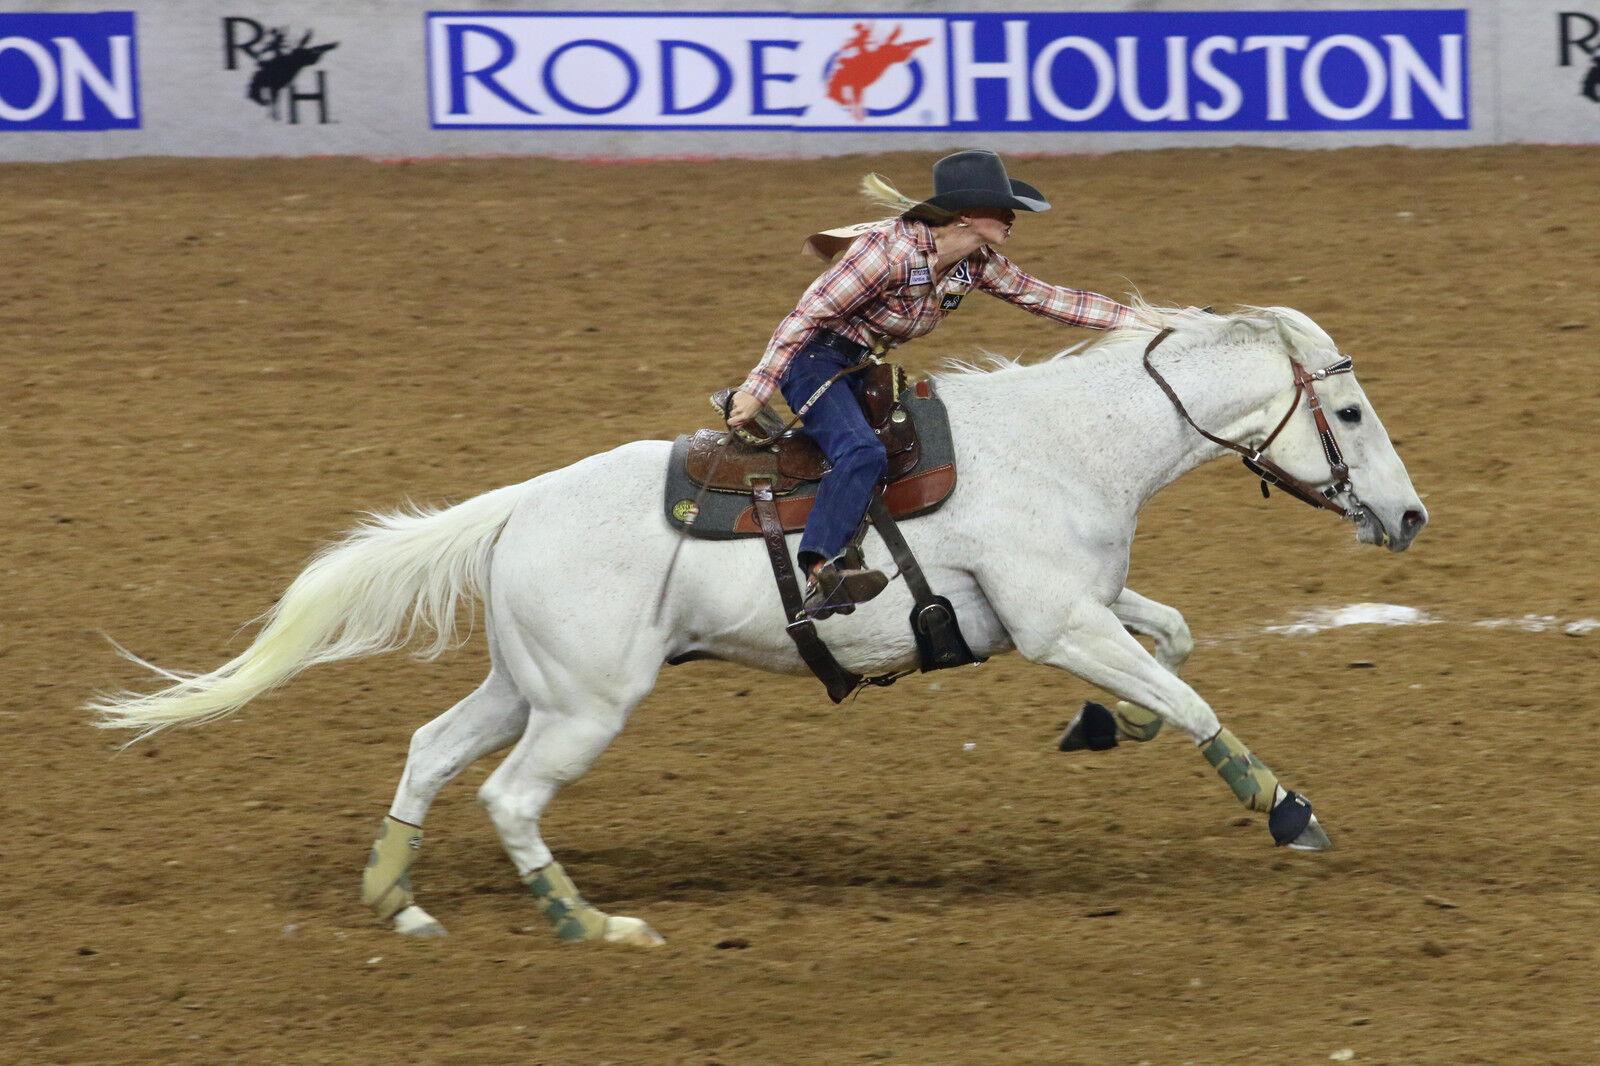 Houston Rodeo Tickets Stubhub Uk